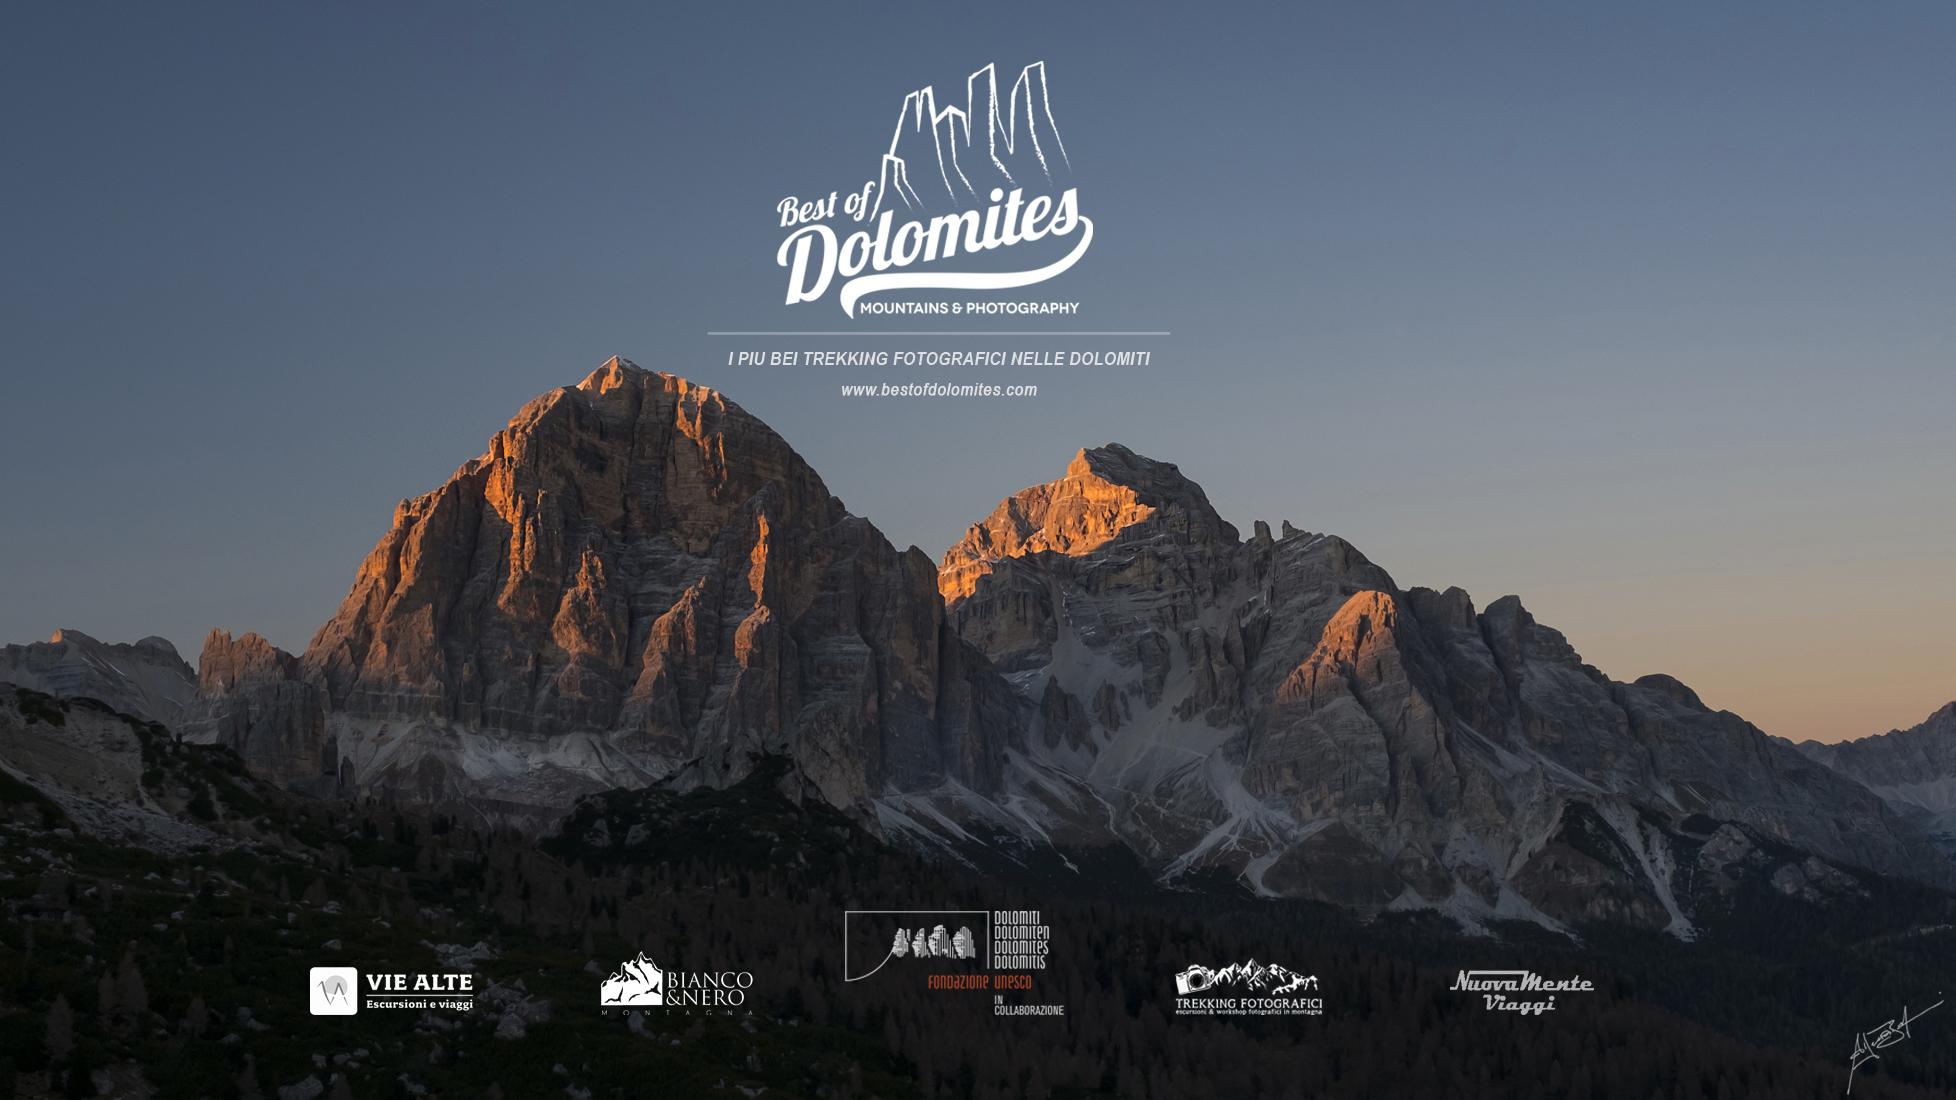 best-of-dolomites-trekking-fotografici-dolomiti-unesco